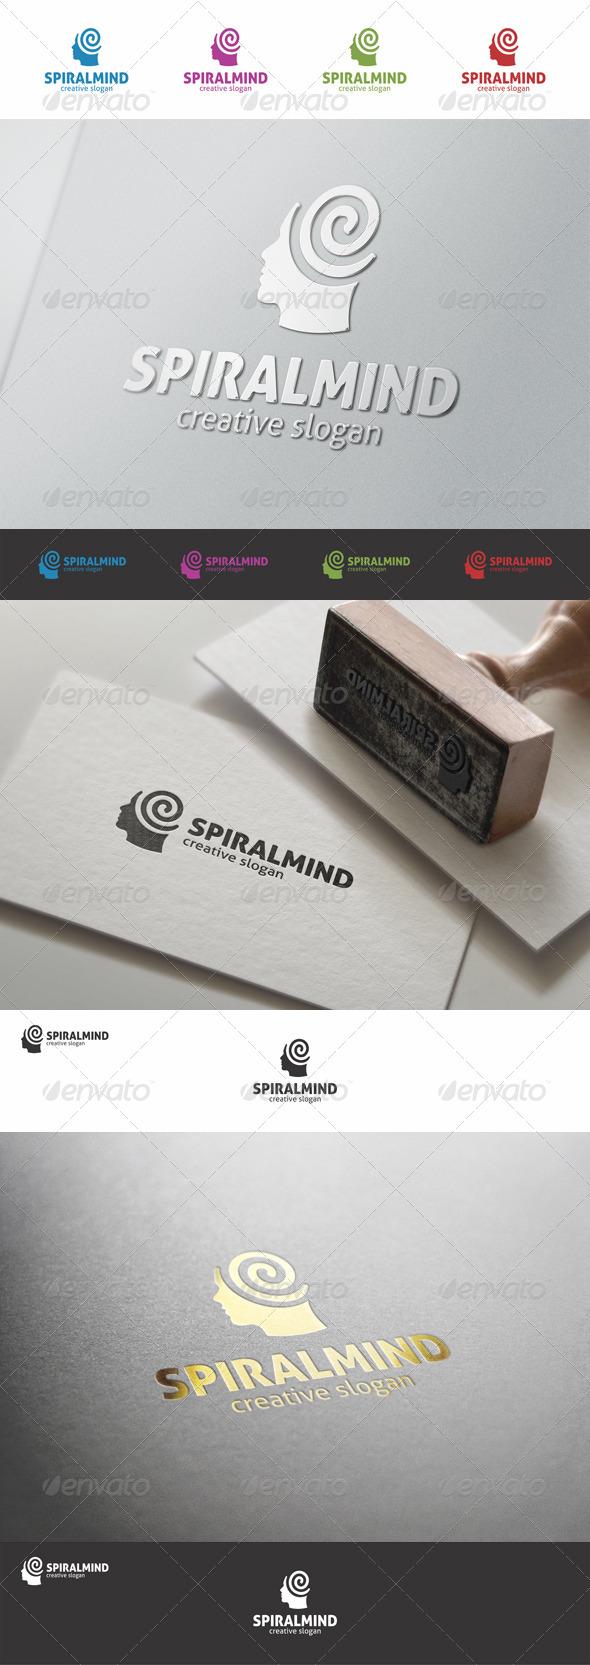 GraphicRiver Spiral Mind Creative Human Logo 8075592